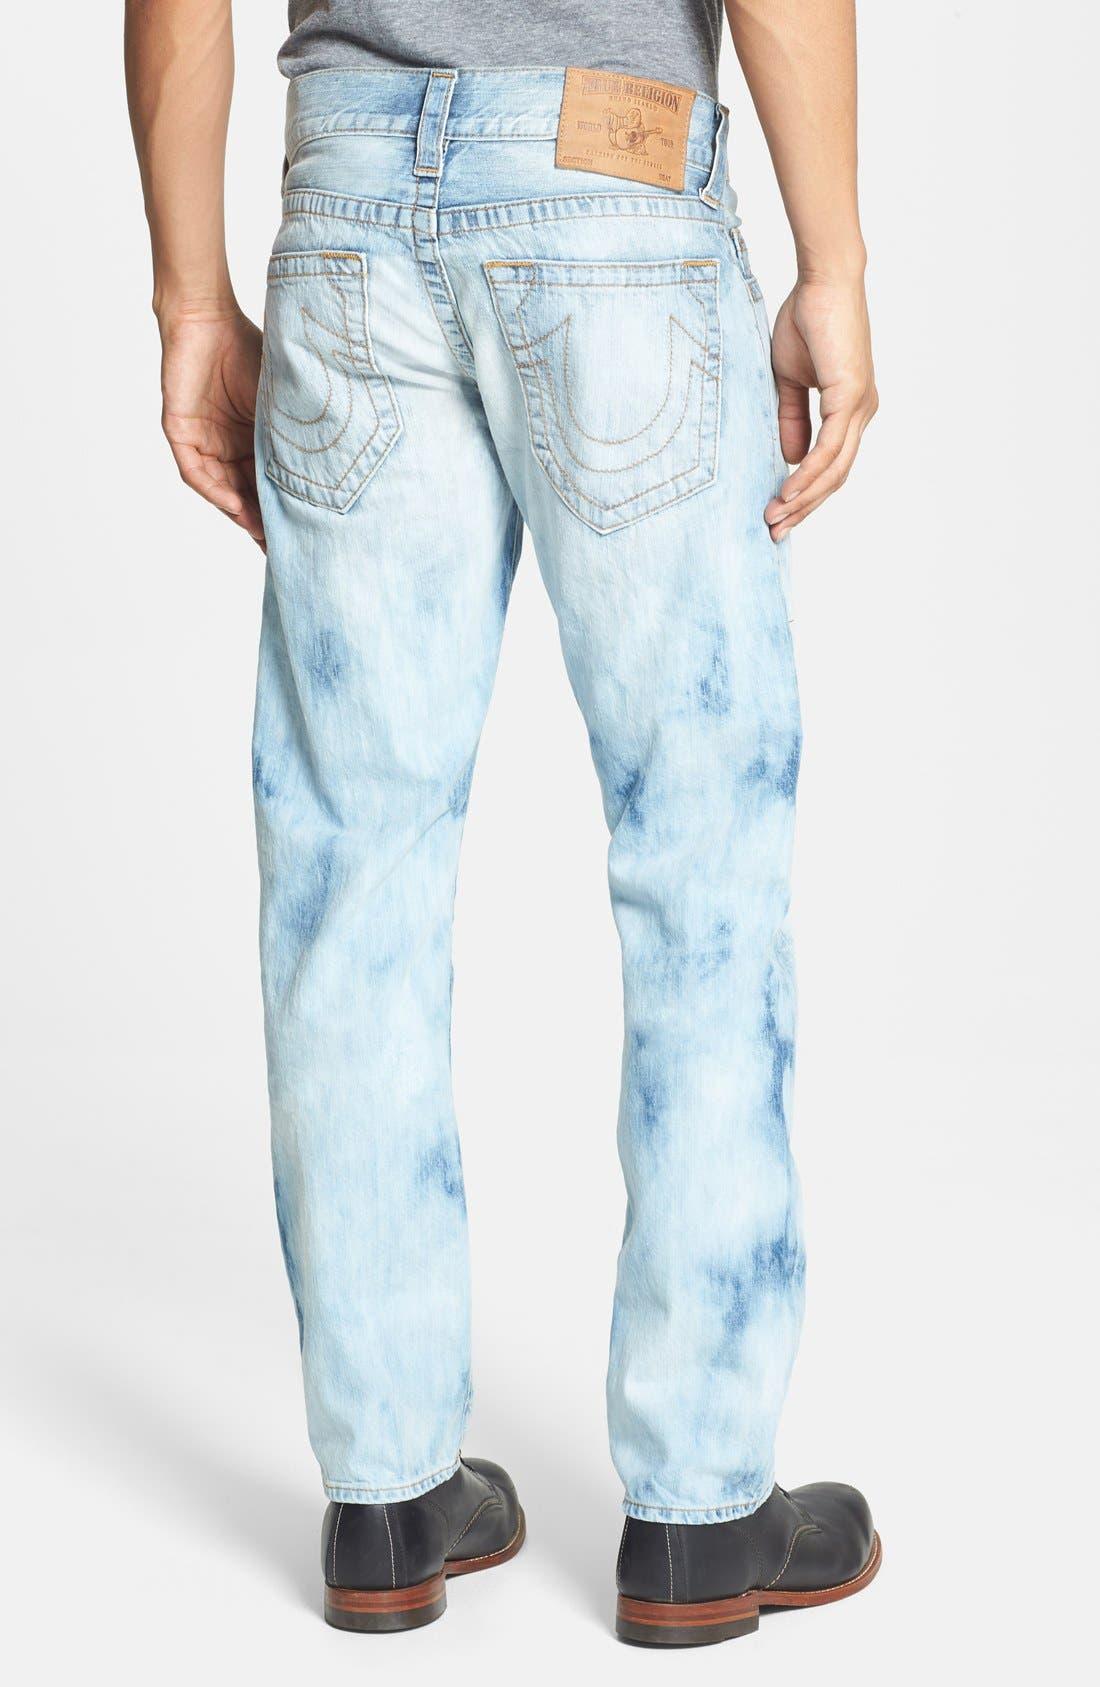 Main Image - True Religion Brand Jeans 'Geno' Straight Leg Jeans (YLL Antelope)